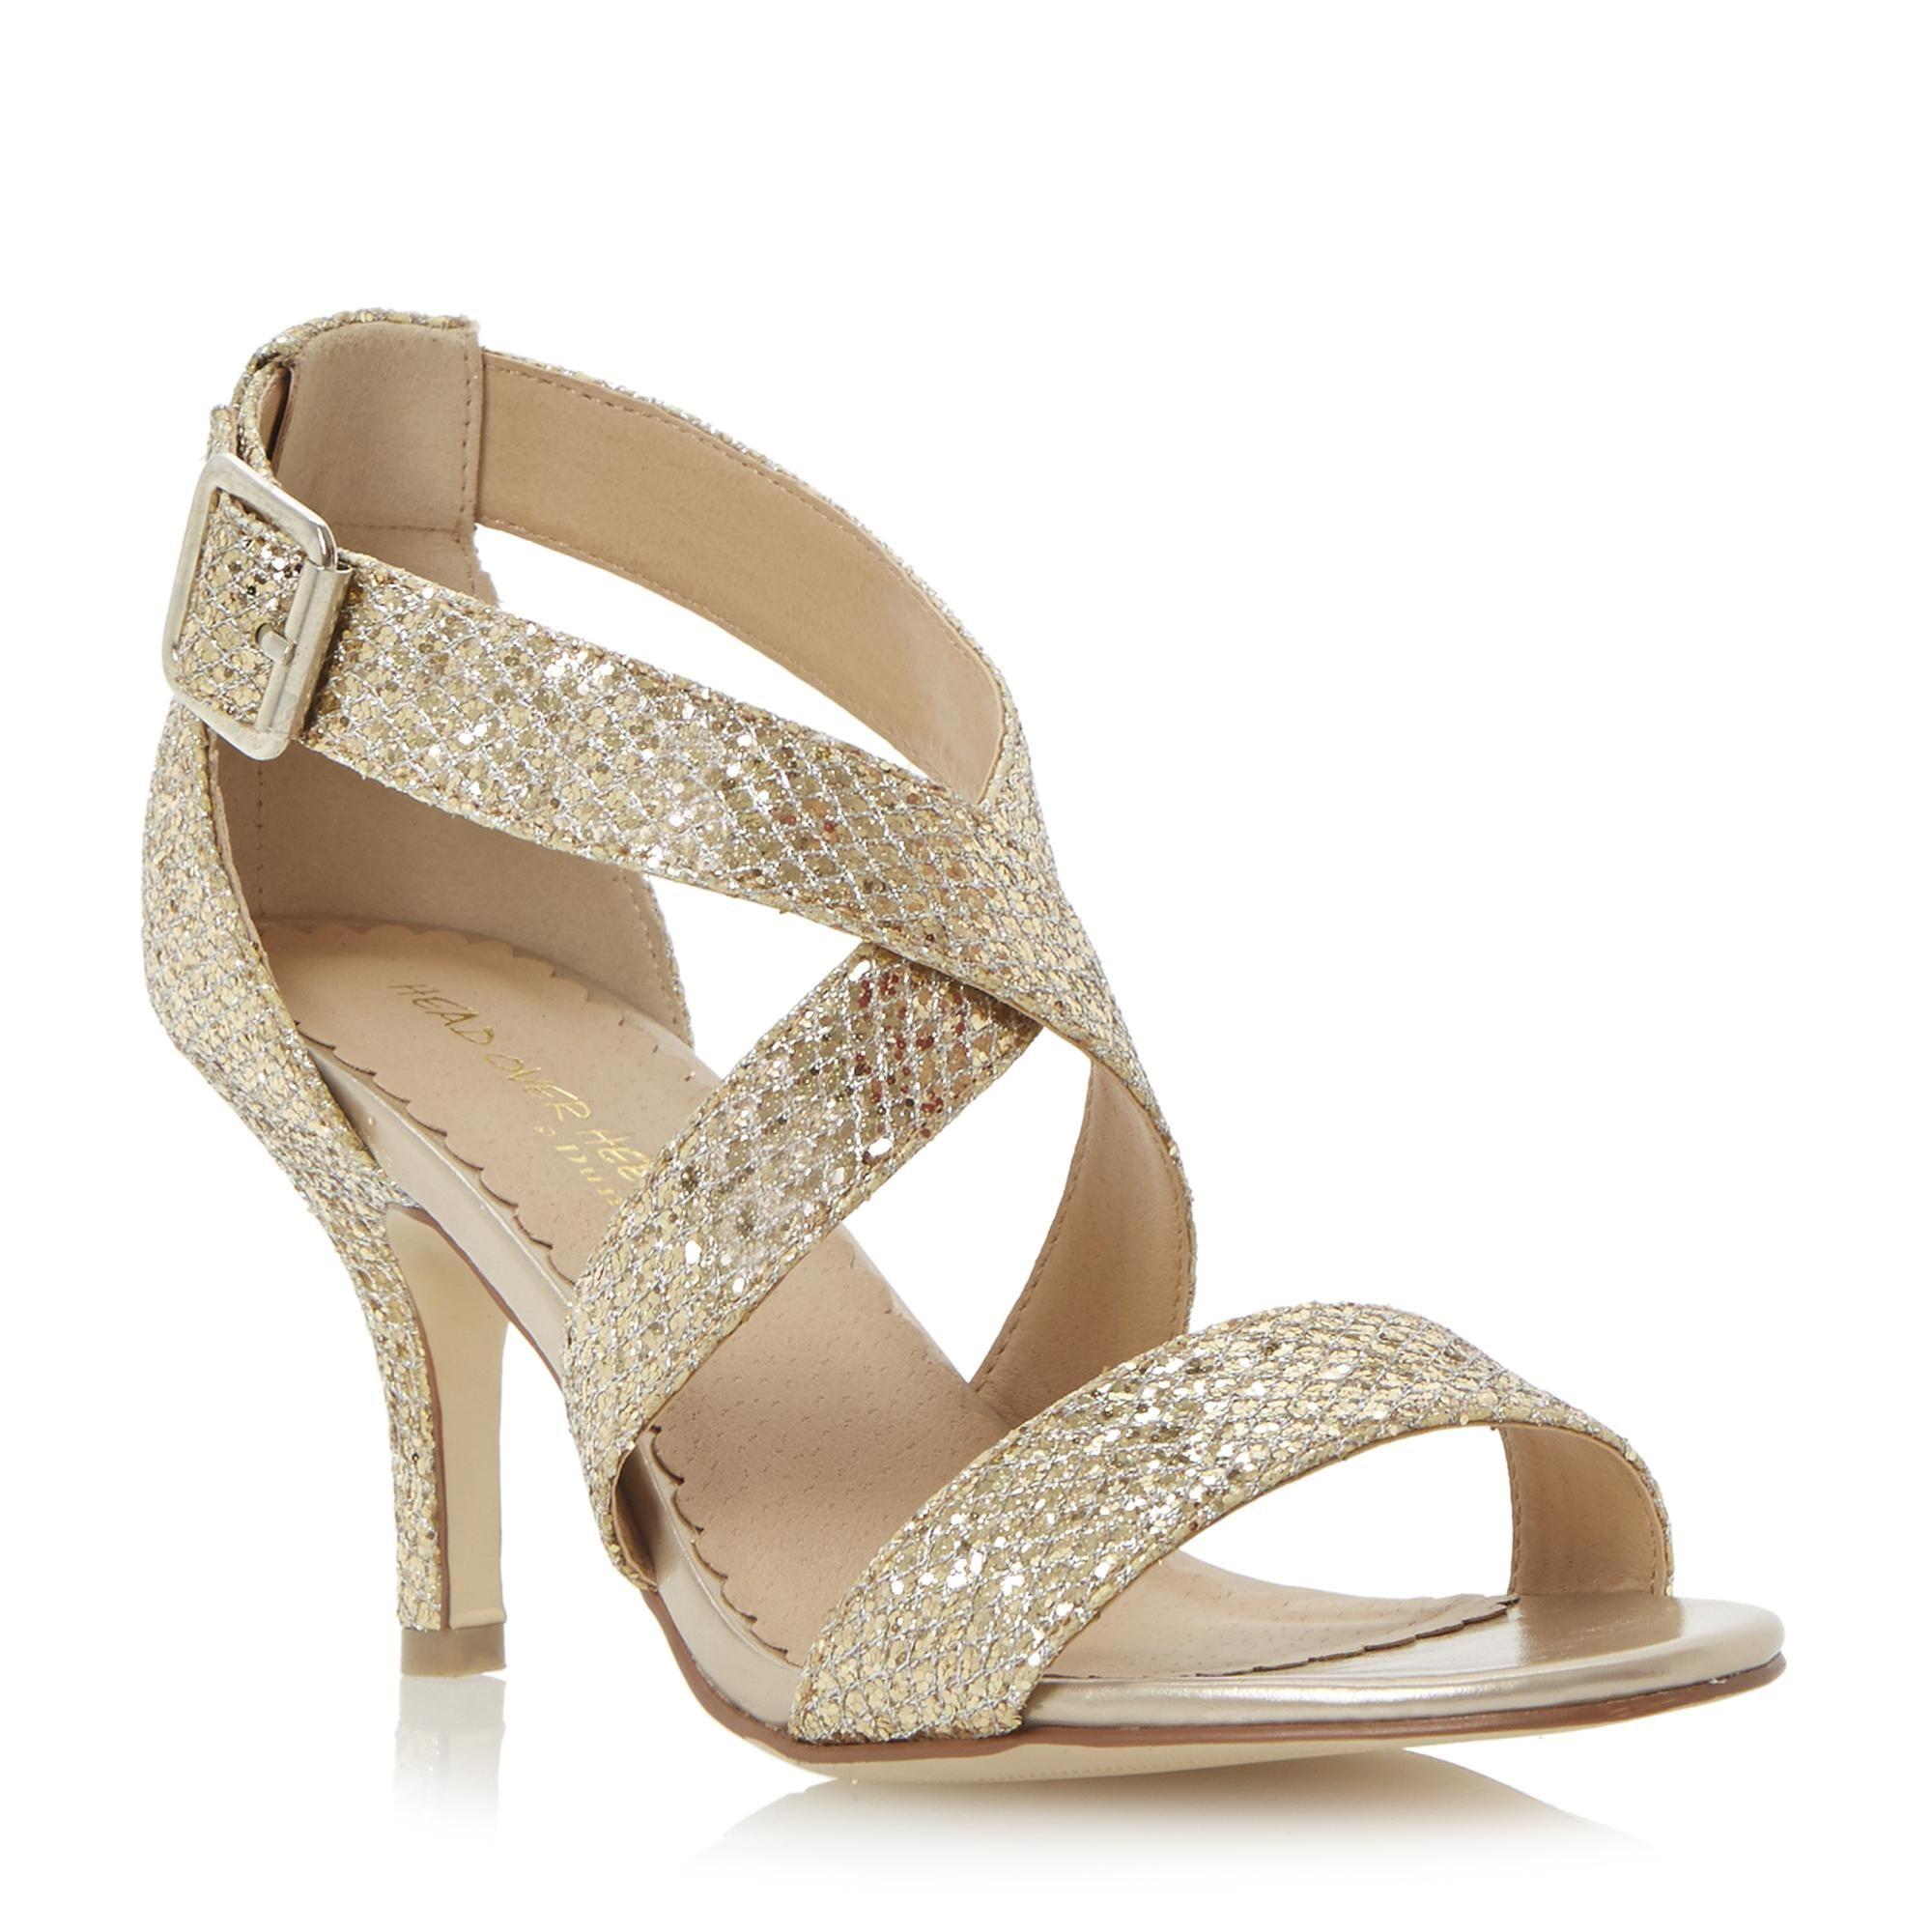 dune glitter sandals